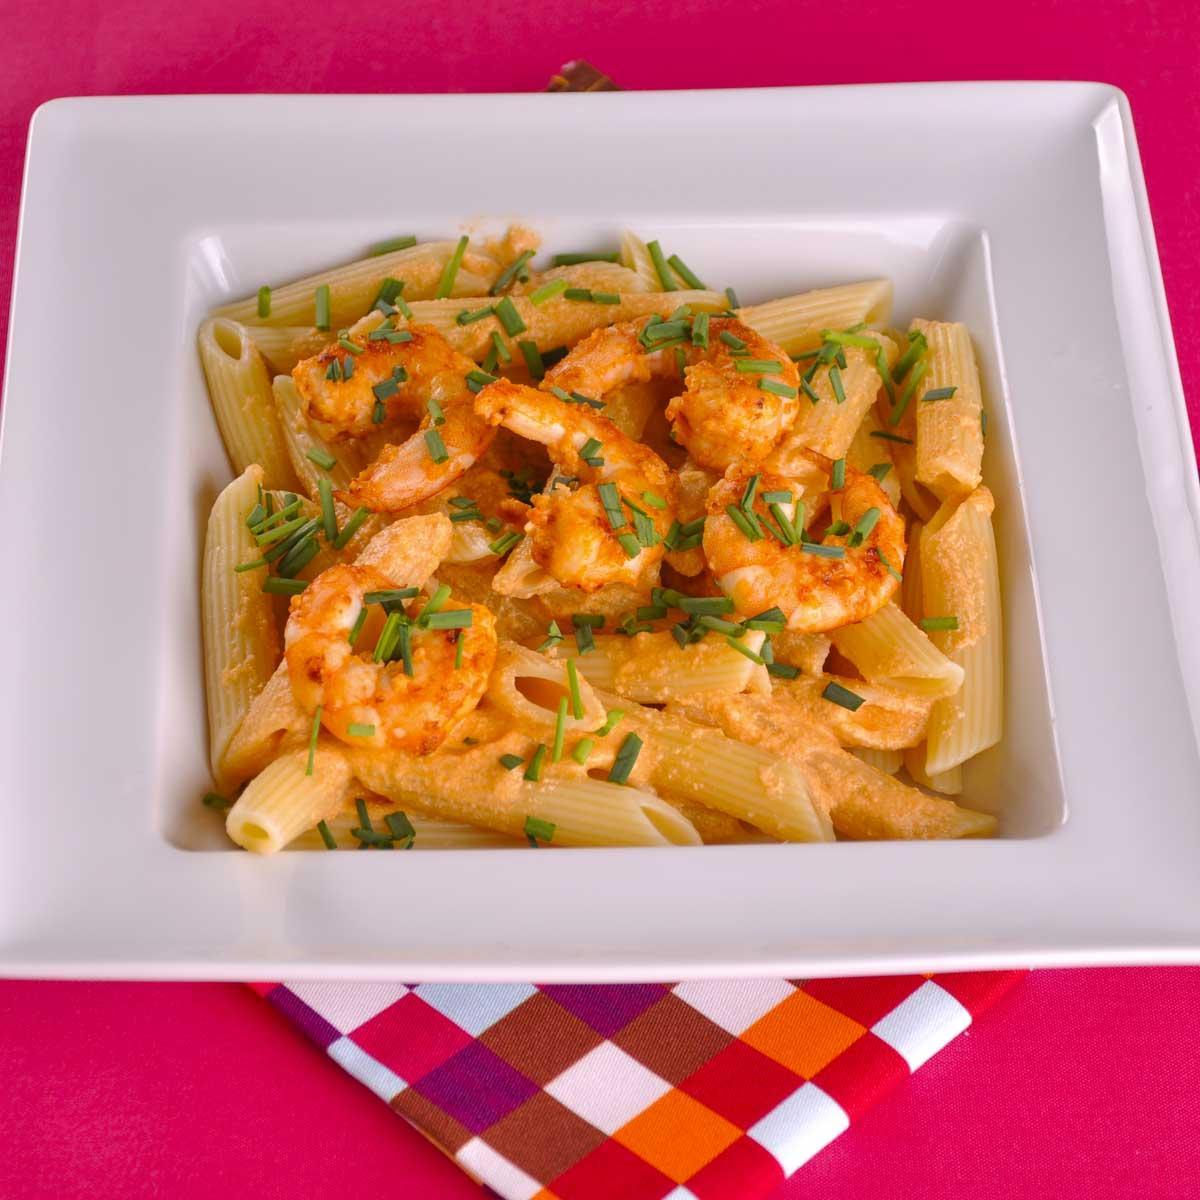 Recette penne aux langoustines cuisine madame figaro for Astuce cuisine rapide